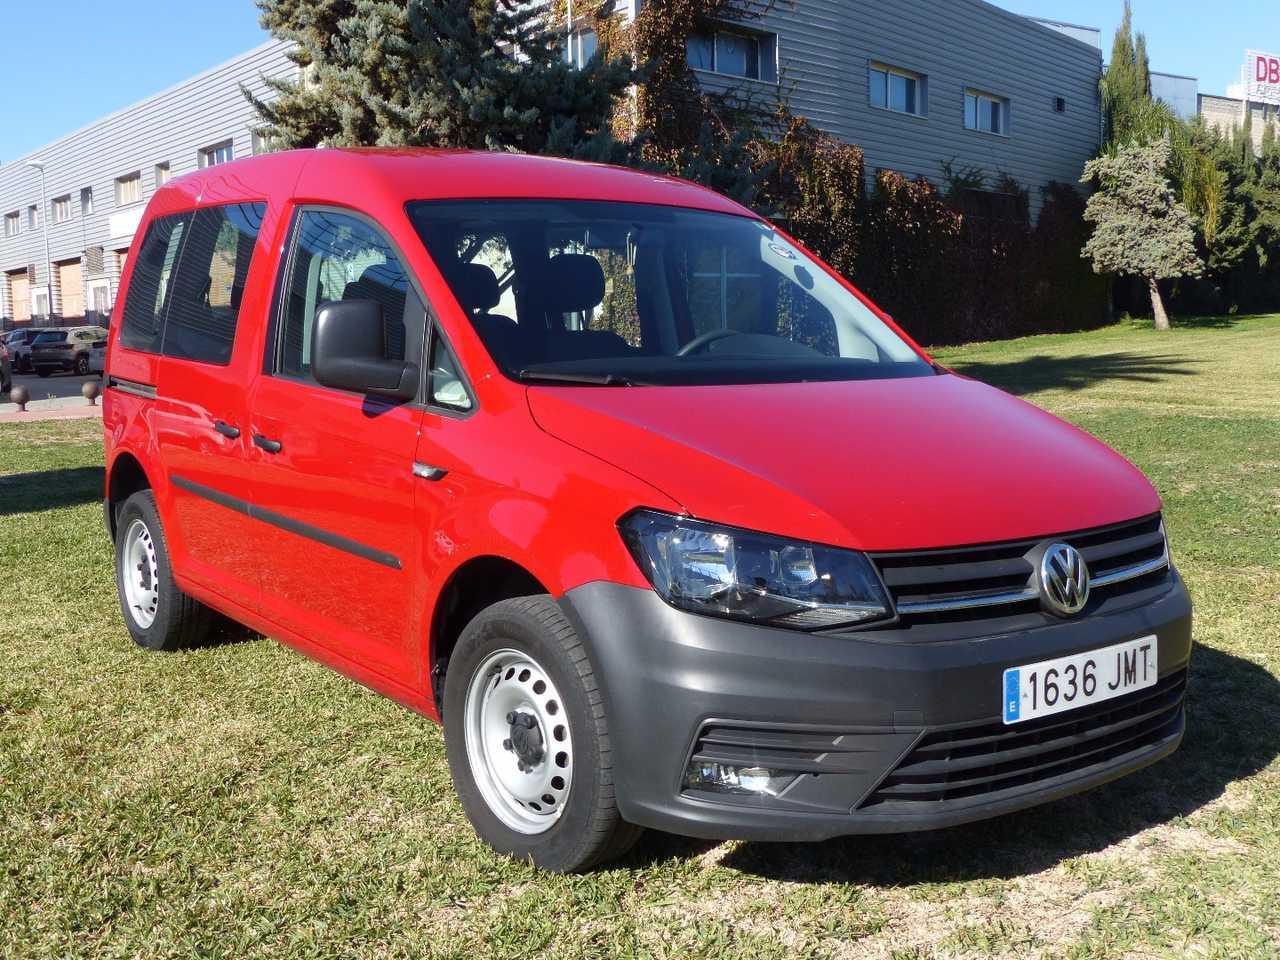 Volkswagen Caddy 2.0 TDI CONFORTLINE 102 CV 5 PLAZAS   - Foto 1